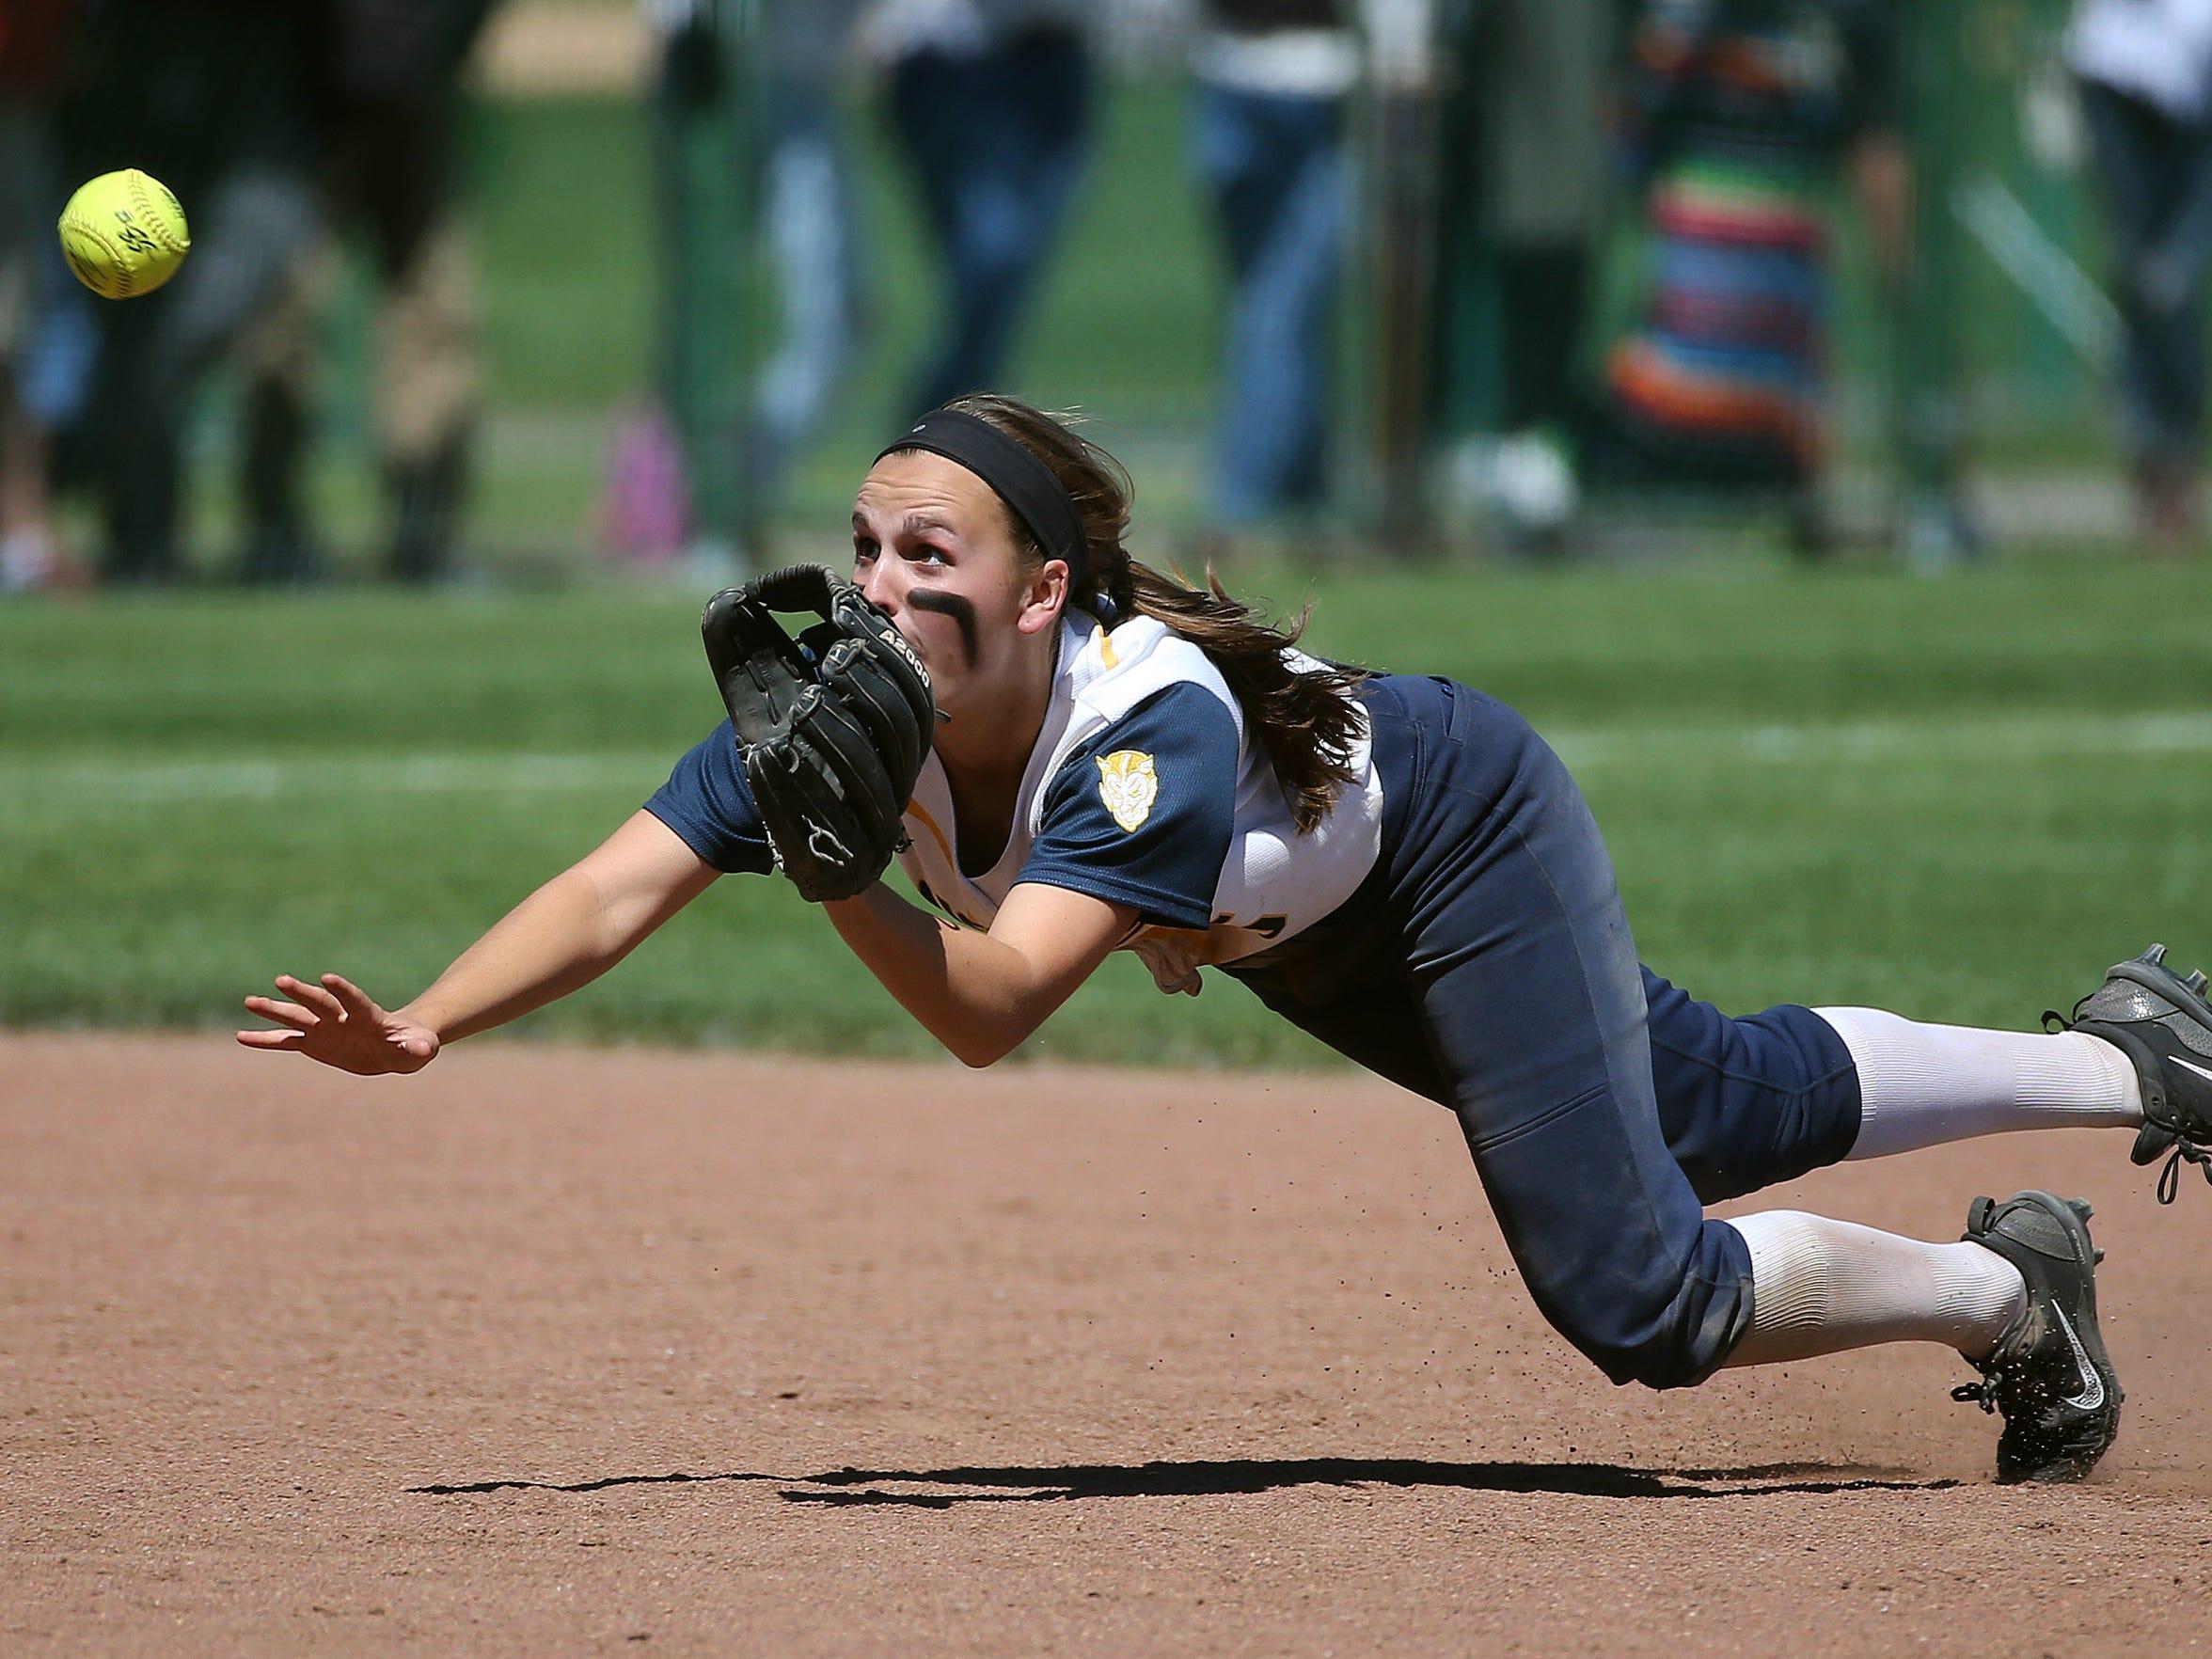 Victor shortstop  Samantha Torlish makes a diving catch